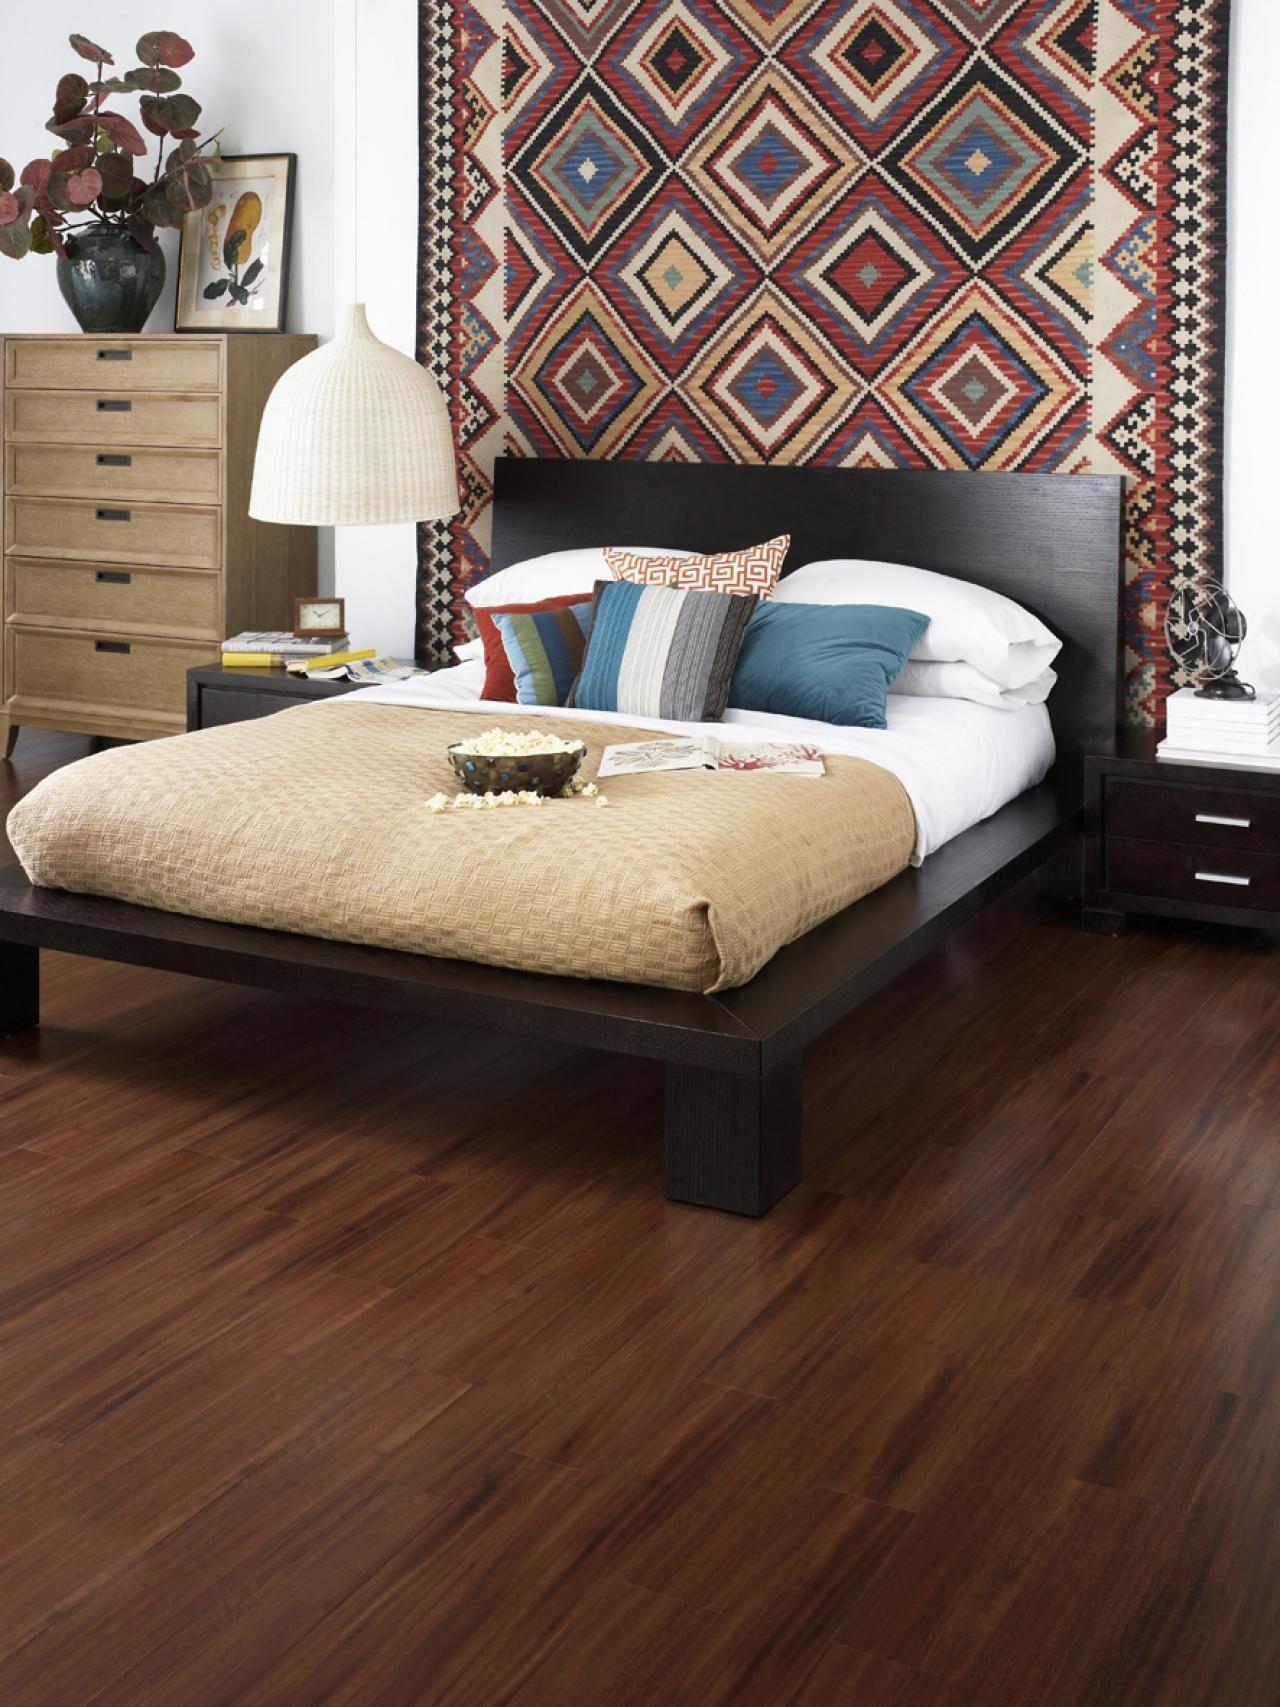 Photo Page  Photo Library  HGTV  Bedroom floor tiles, Vinyl